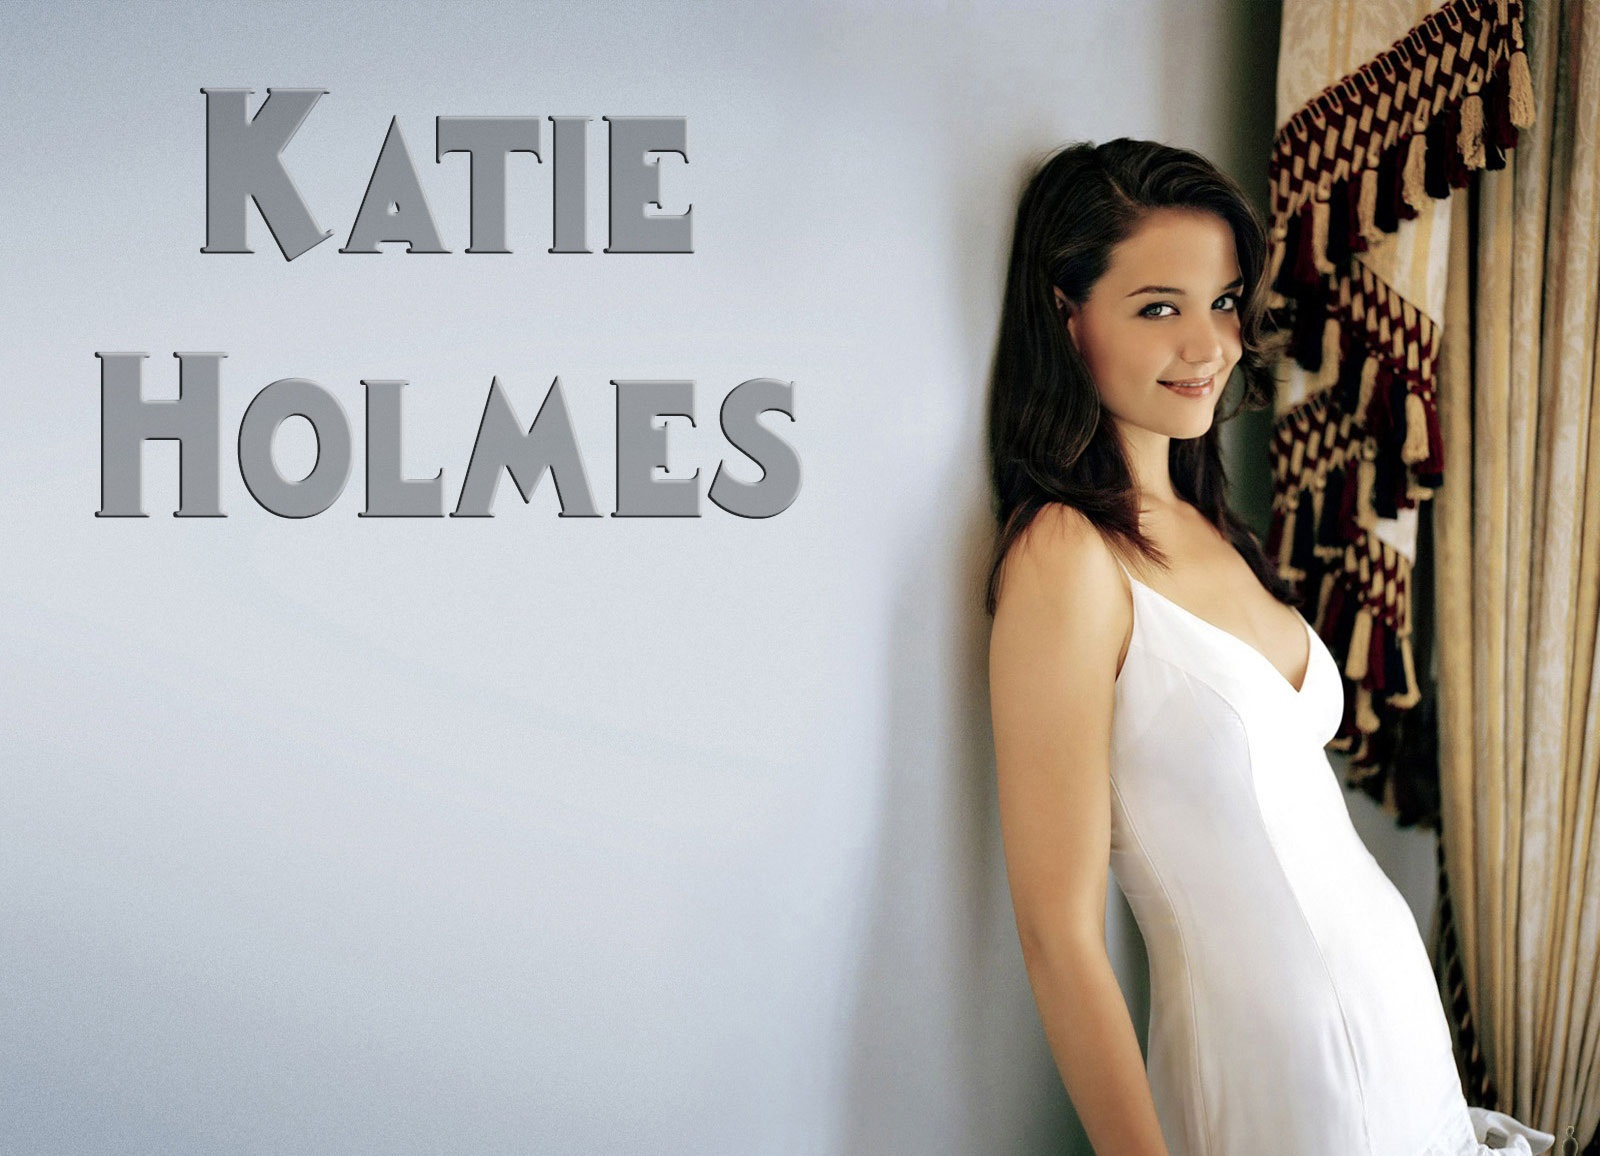 katie-holmes-hot-photos